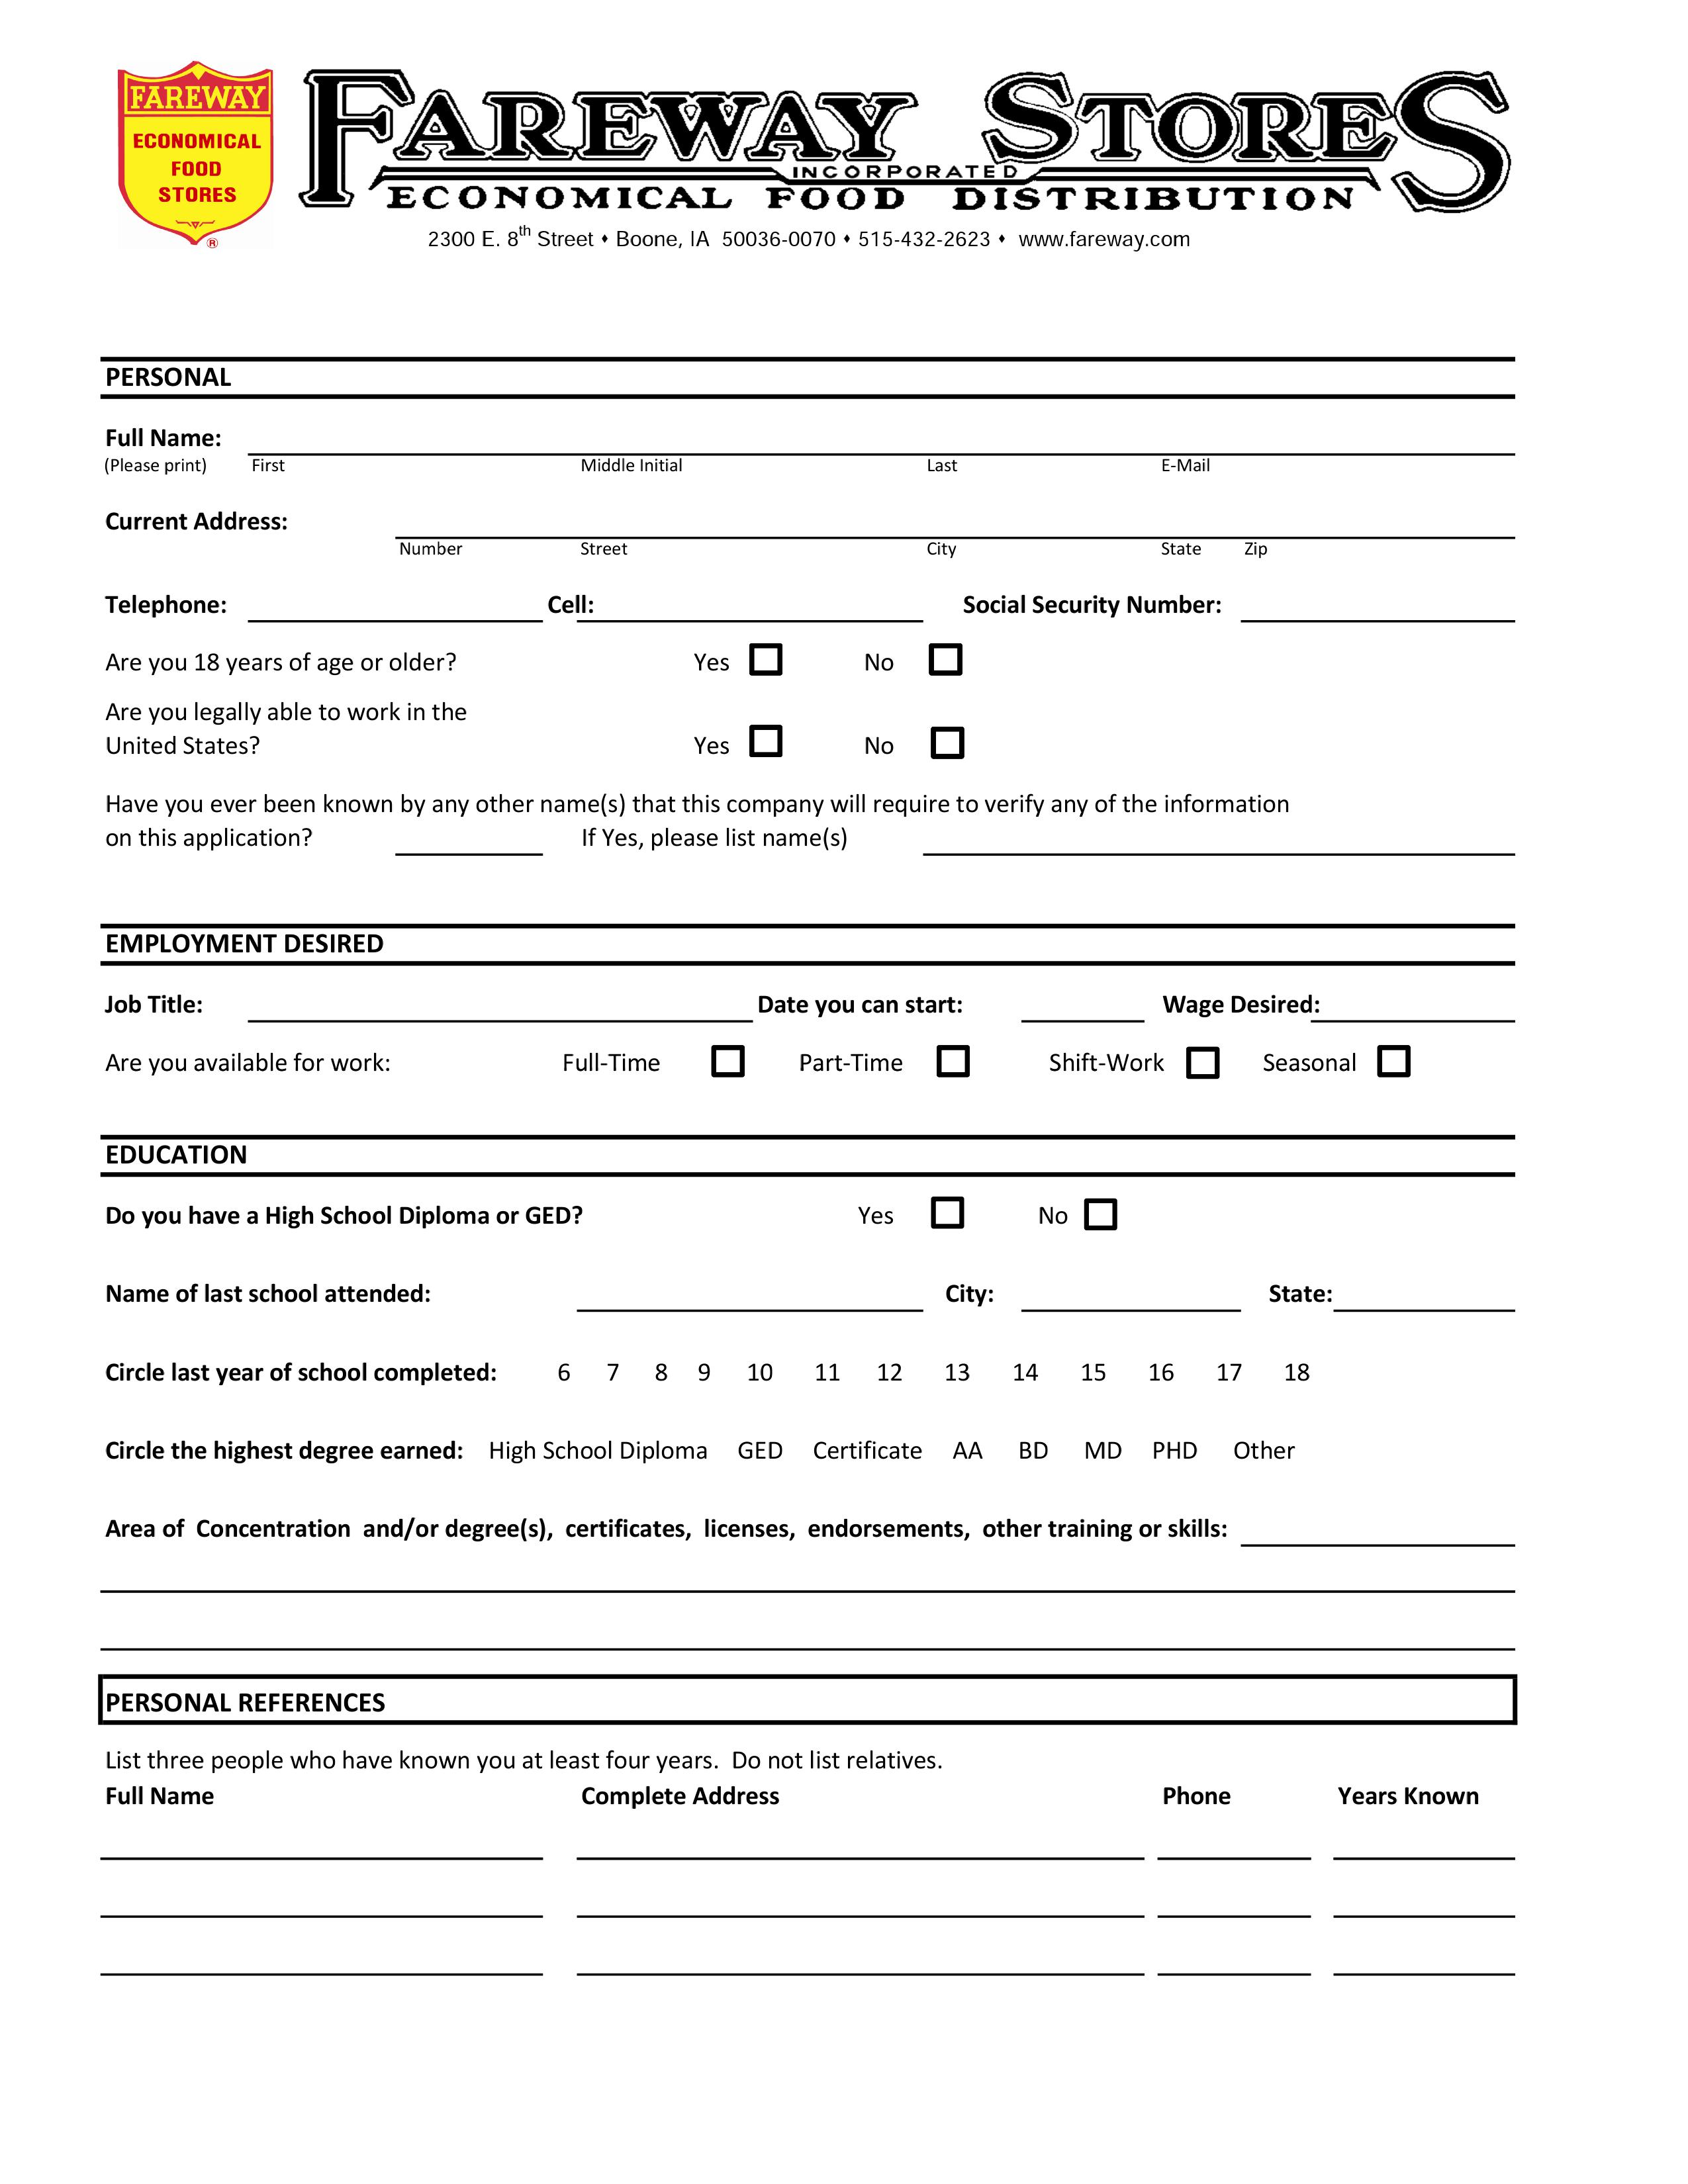 Fareway Job Application Form - Free Job Application Form